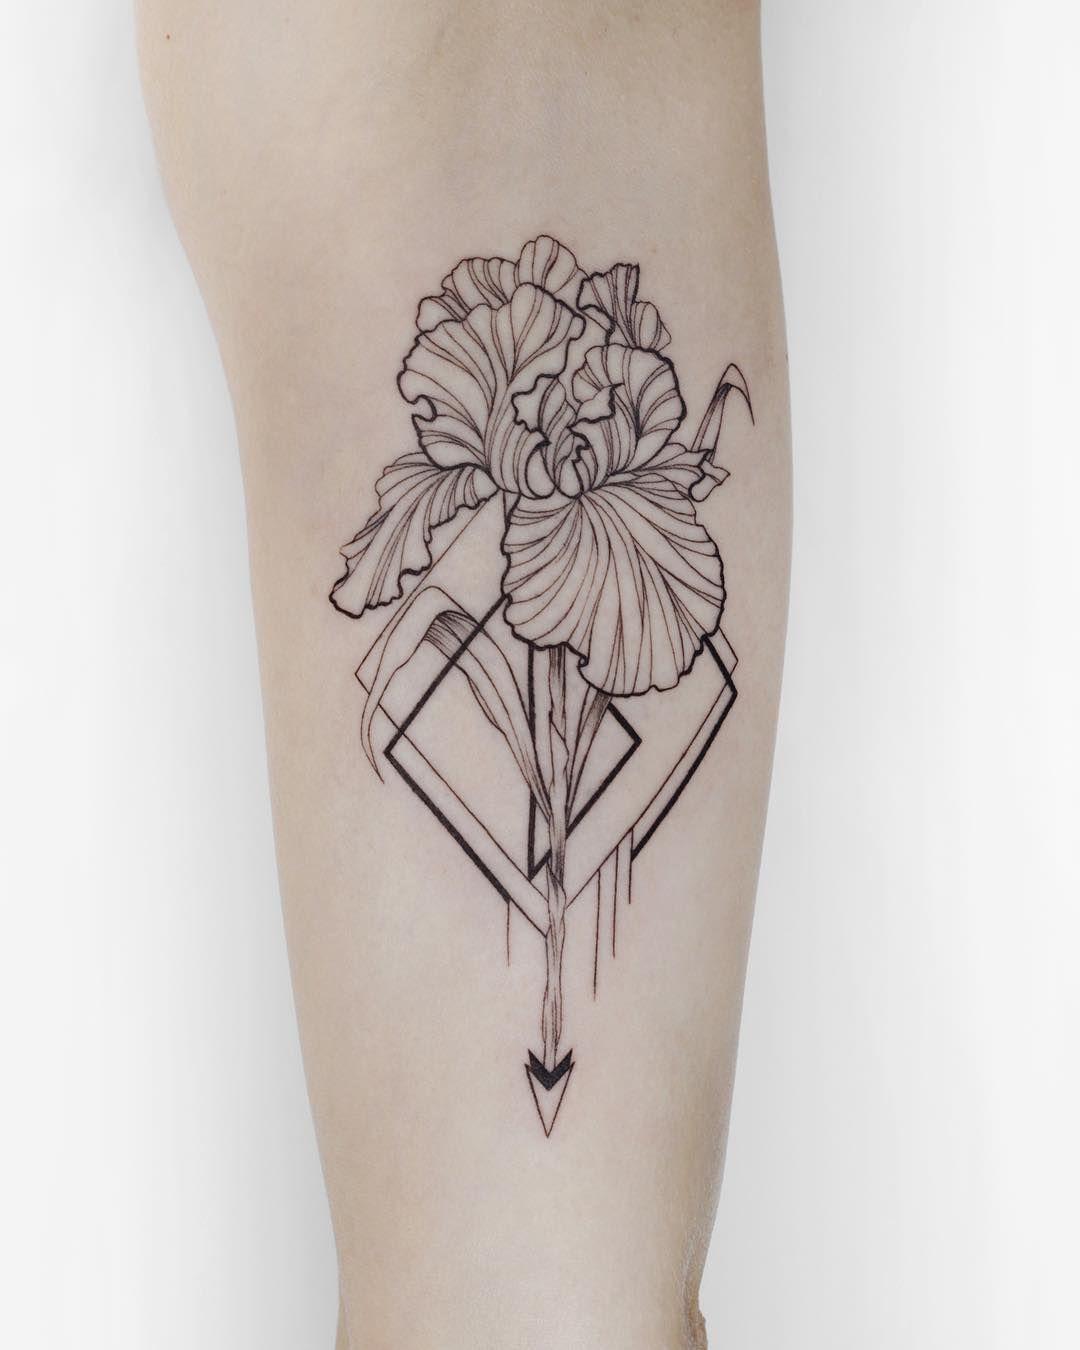 Tatuirovka Dlya Devushki Tatuirovka Iris Tattoo Linework Dotwork Ink Blackwork Blackworkers Blackworke Iris Tattoo Iris Flower Tattoo Thigh Tattoo Designs